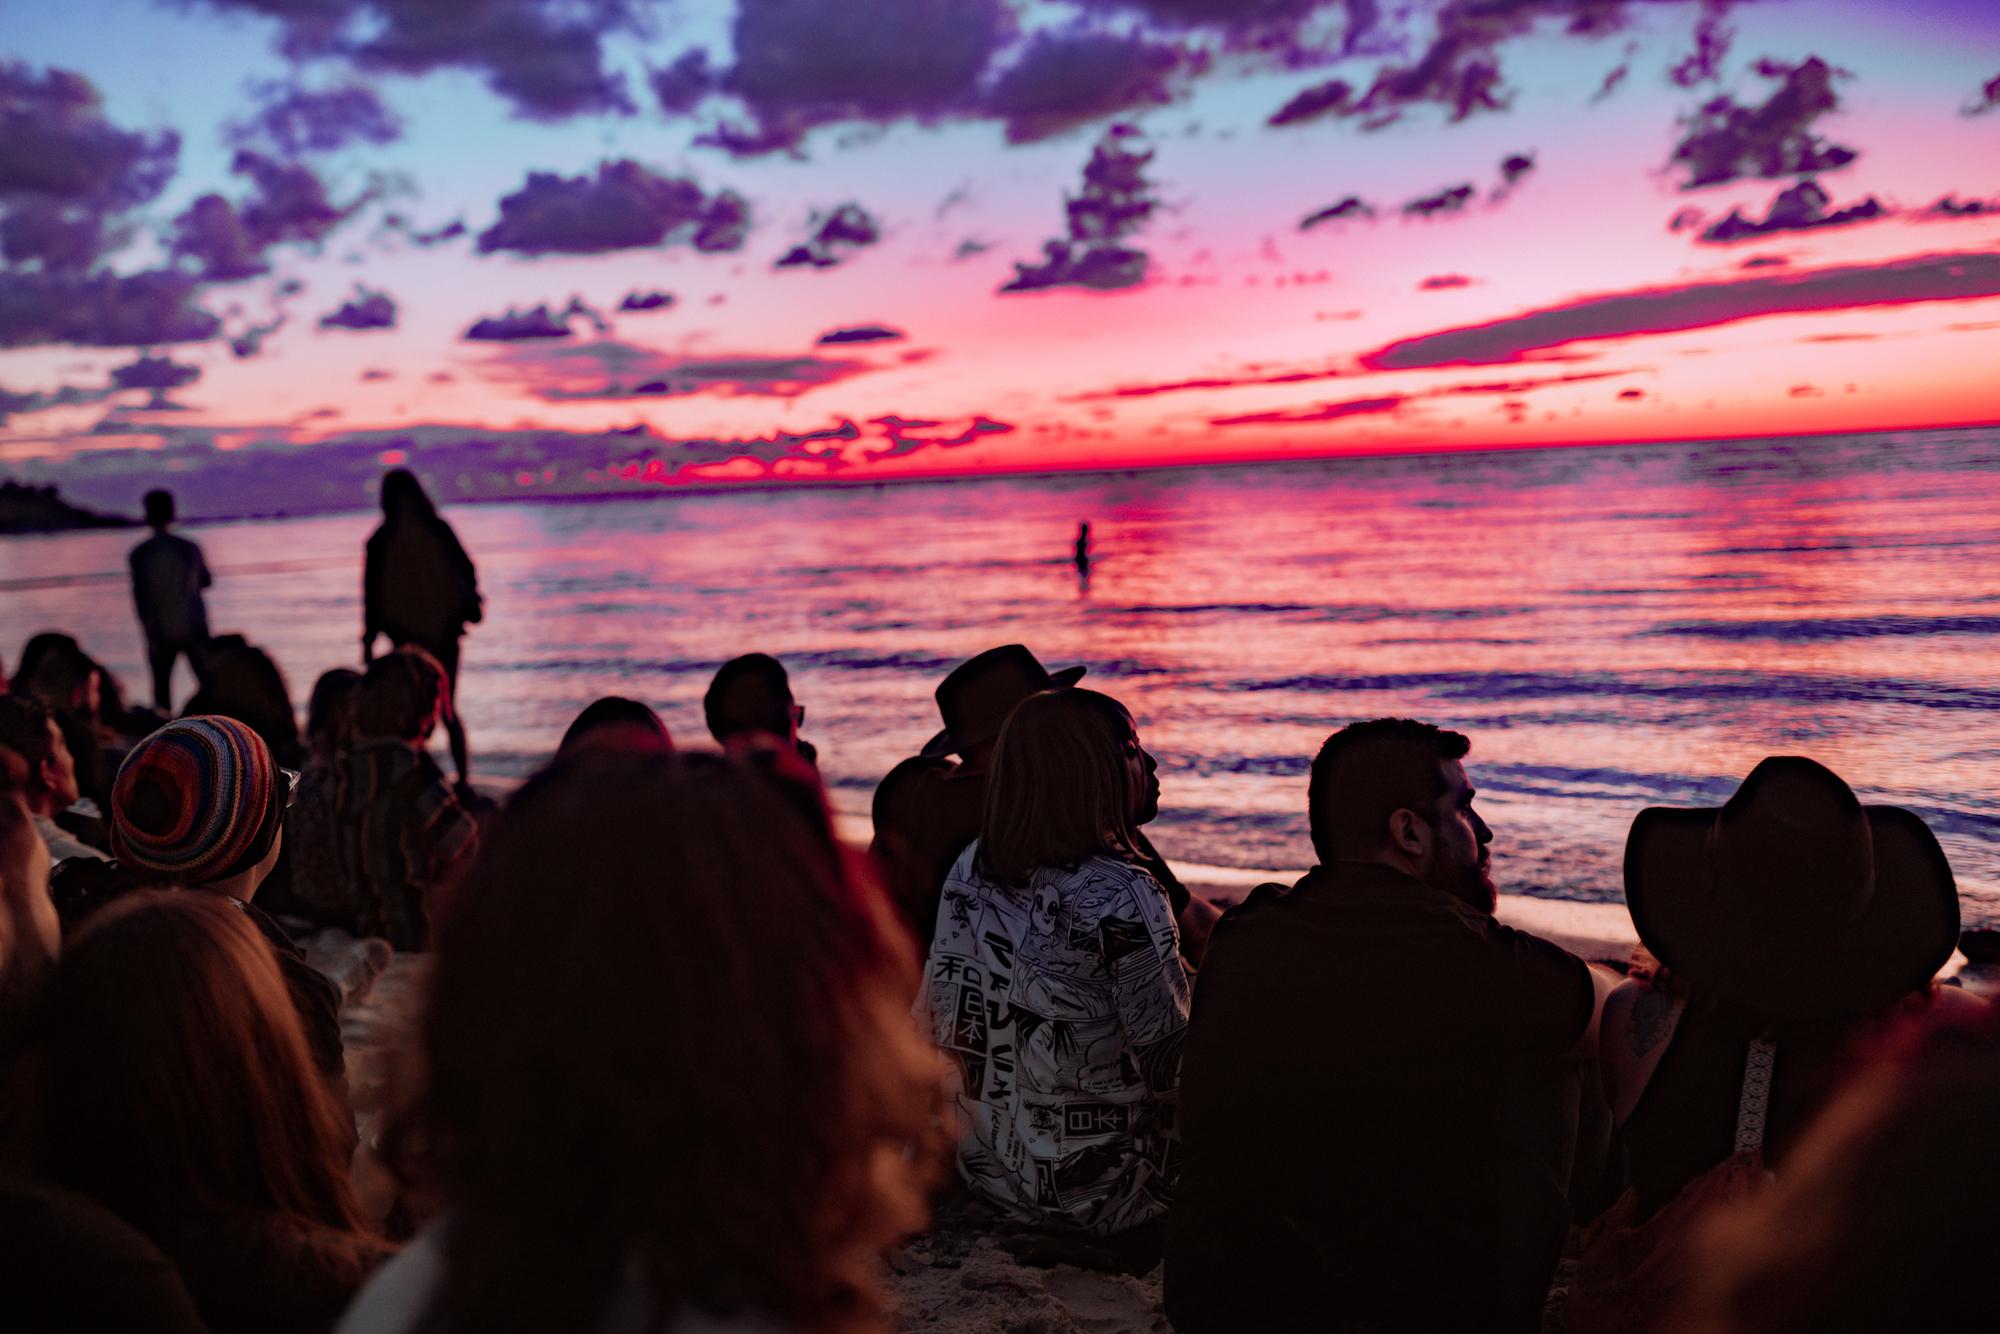 Make love festival in Miami sunset